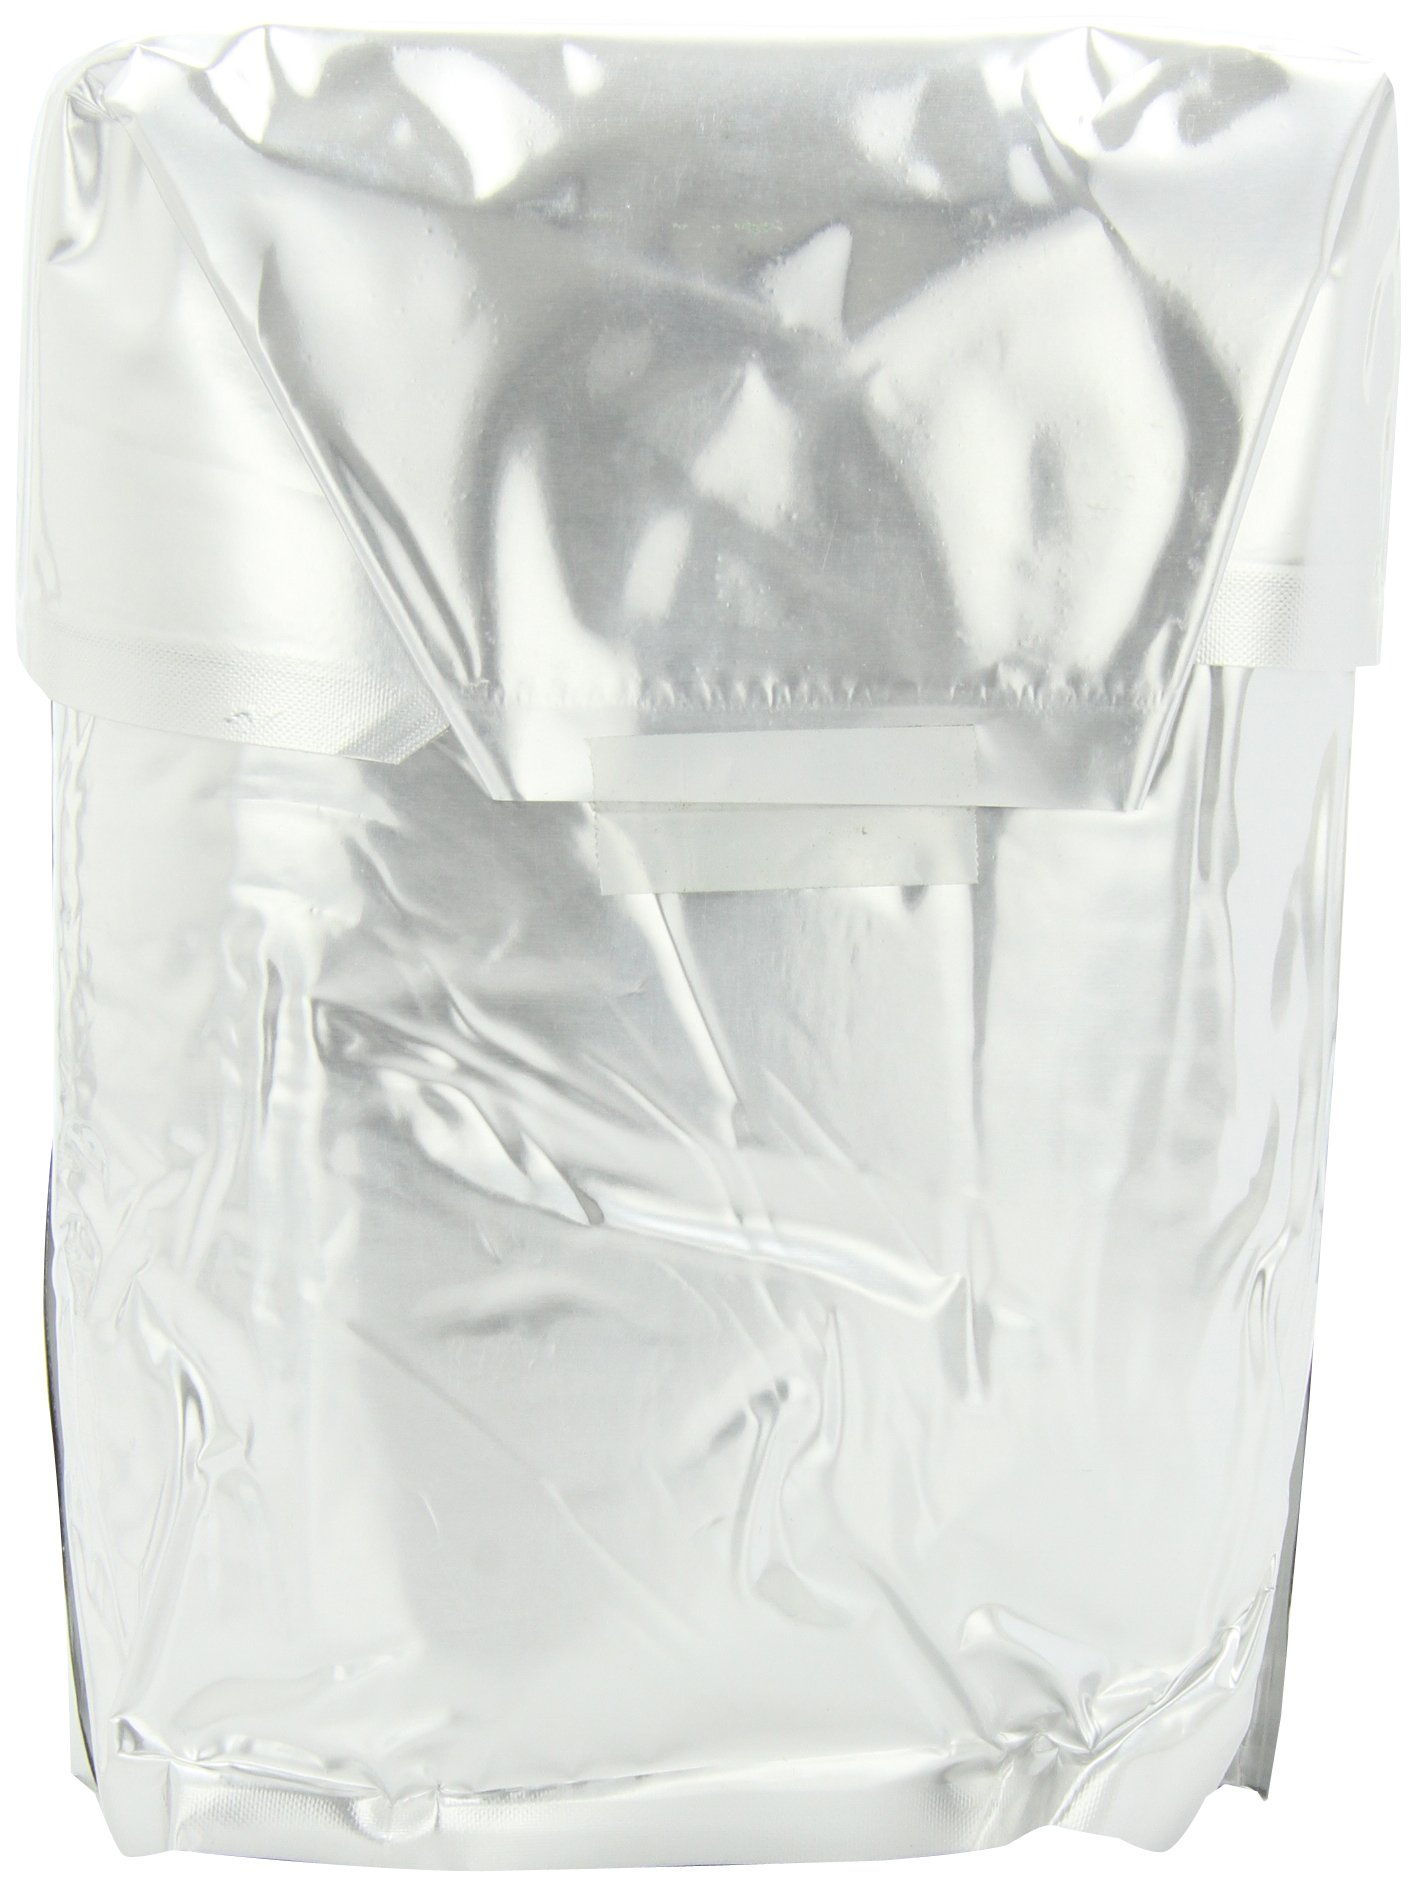 Pure Hawaiian Spirulina Powder 5 lb Bulk Bag – Boosts Energy and Supports Immunity – Vegan, Non GMO – Natural Superfood Grown in Hawaii by Nutrex Hawaii (Image #4)